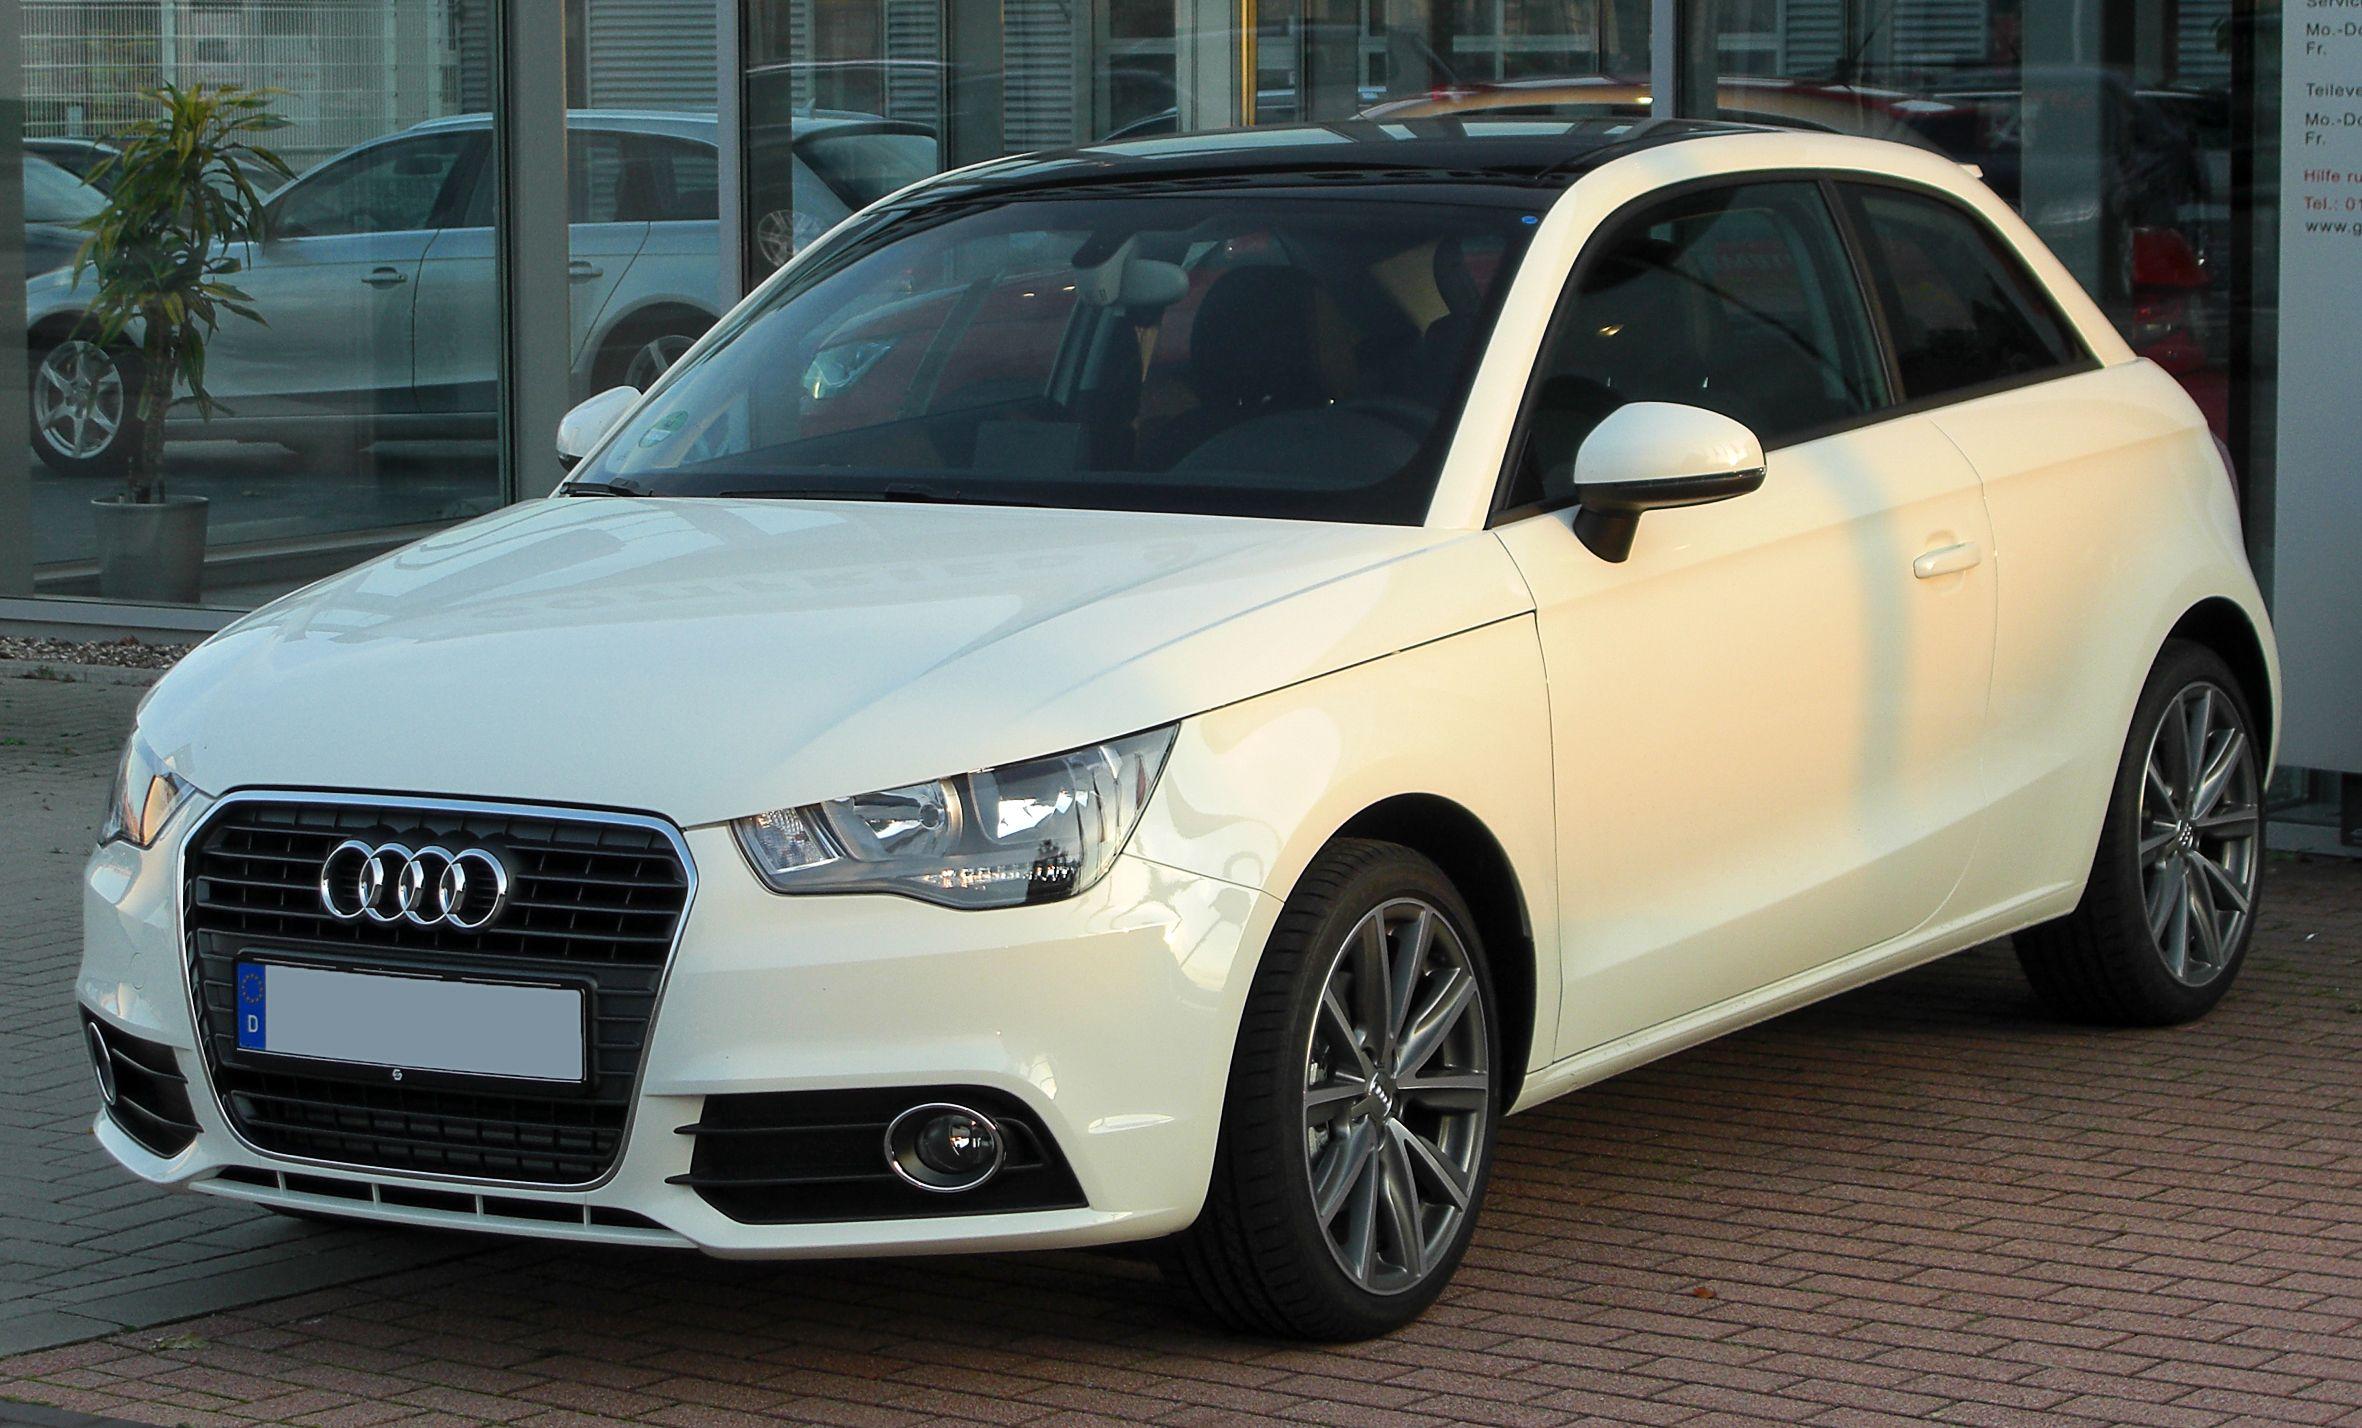 Audi a1 1 6 tdi ambition audi a1diesel vehicleshtml